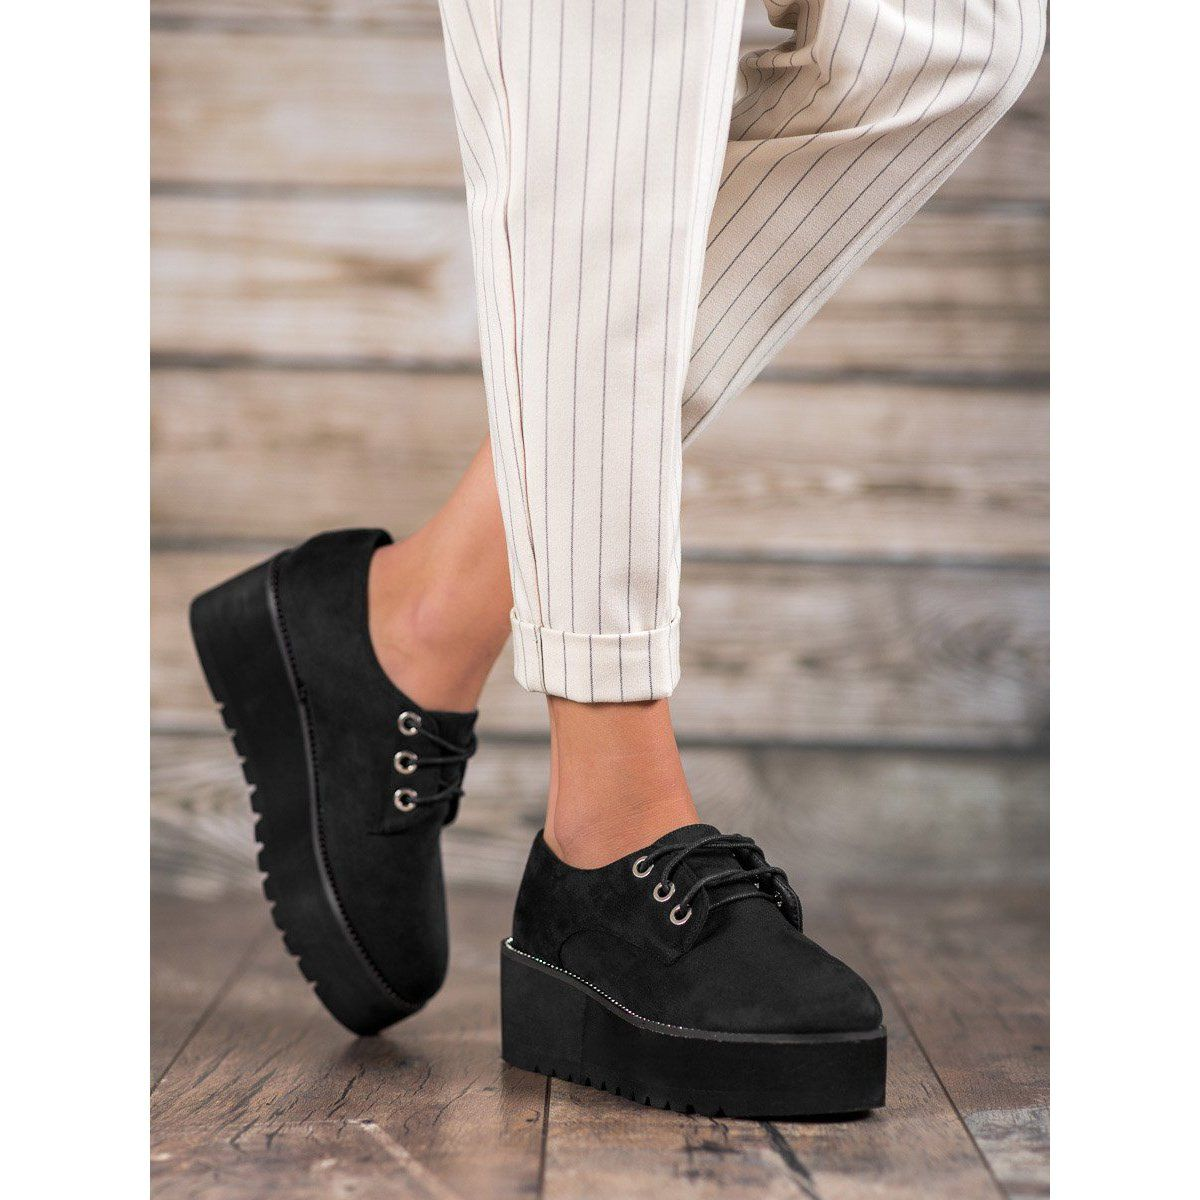 Shelovet Zamszowe Polbuty Na Platformie Czarne Black Shoes Women Shoes Women Heels Suede Shoes